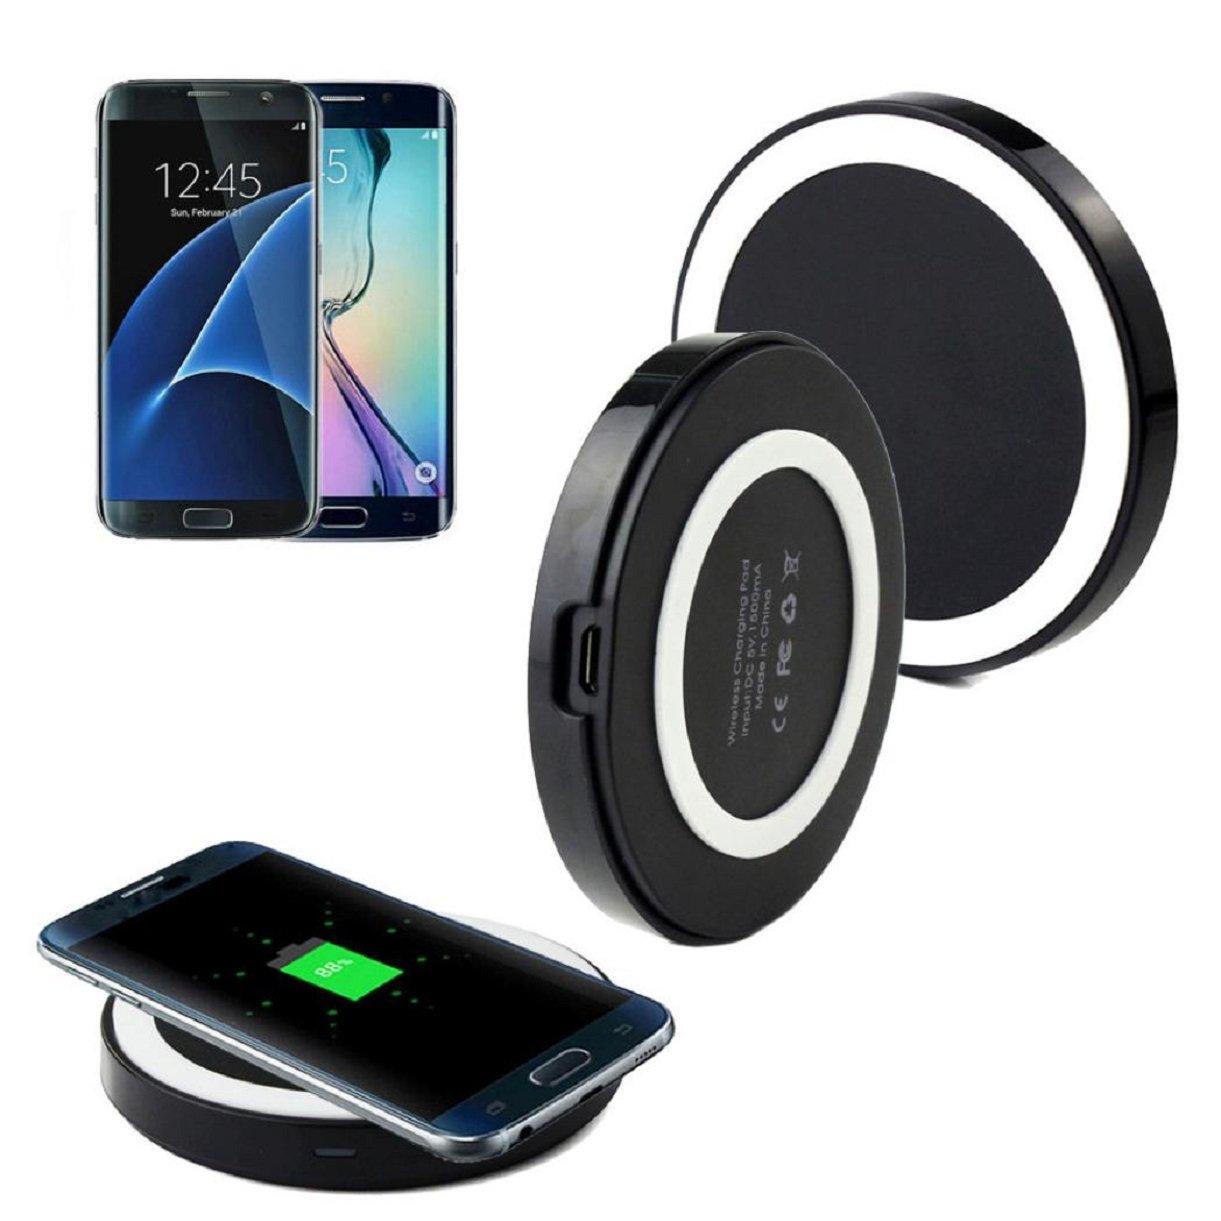 Galaxy S7/S7 Edge Wireless Charger, Lookatool Qi Wireless Power Charger Charging Pad For Samsung Galaxy S7/S7 Edge (White )